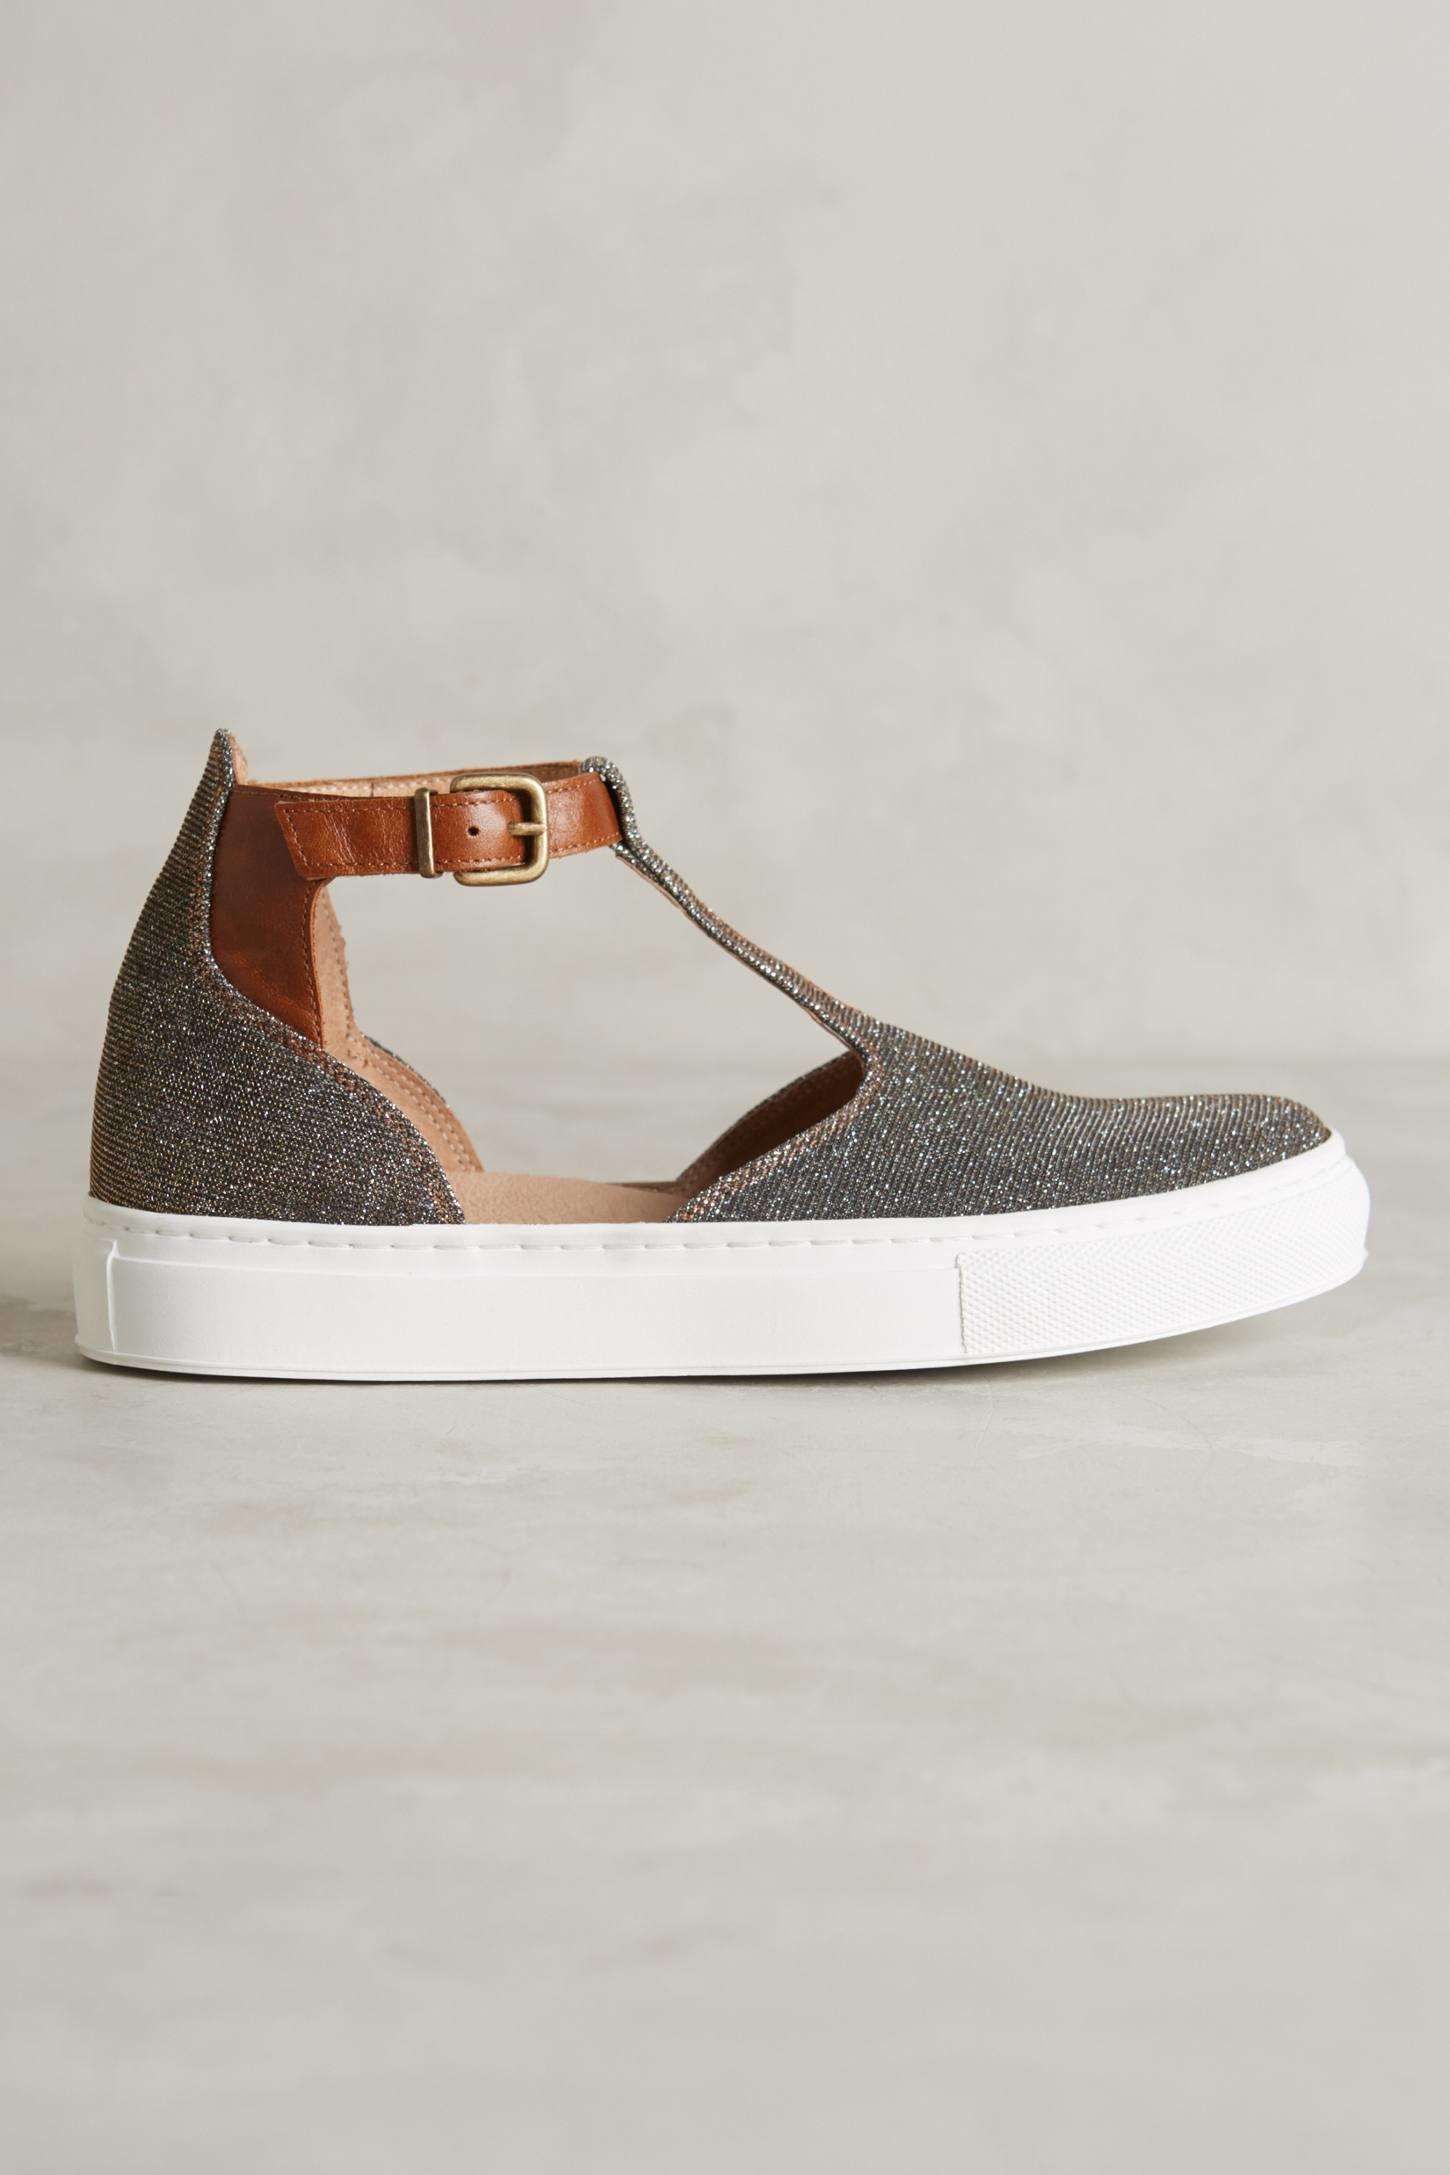 Lyst - Kmb T-strap Sneakers in Metallic